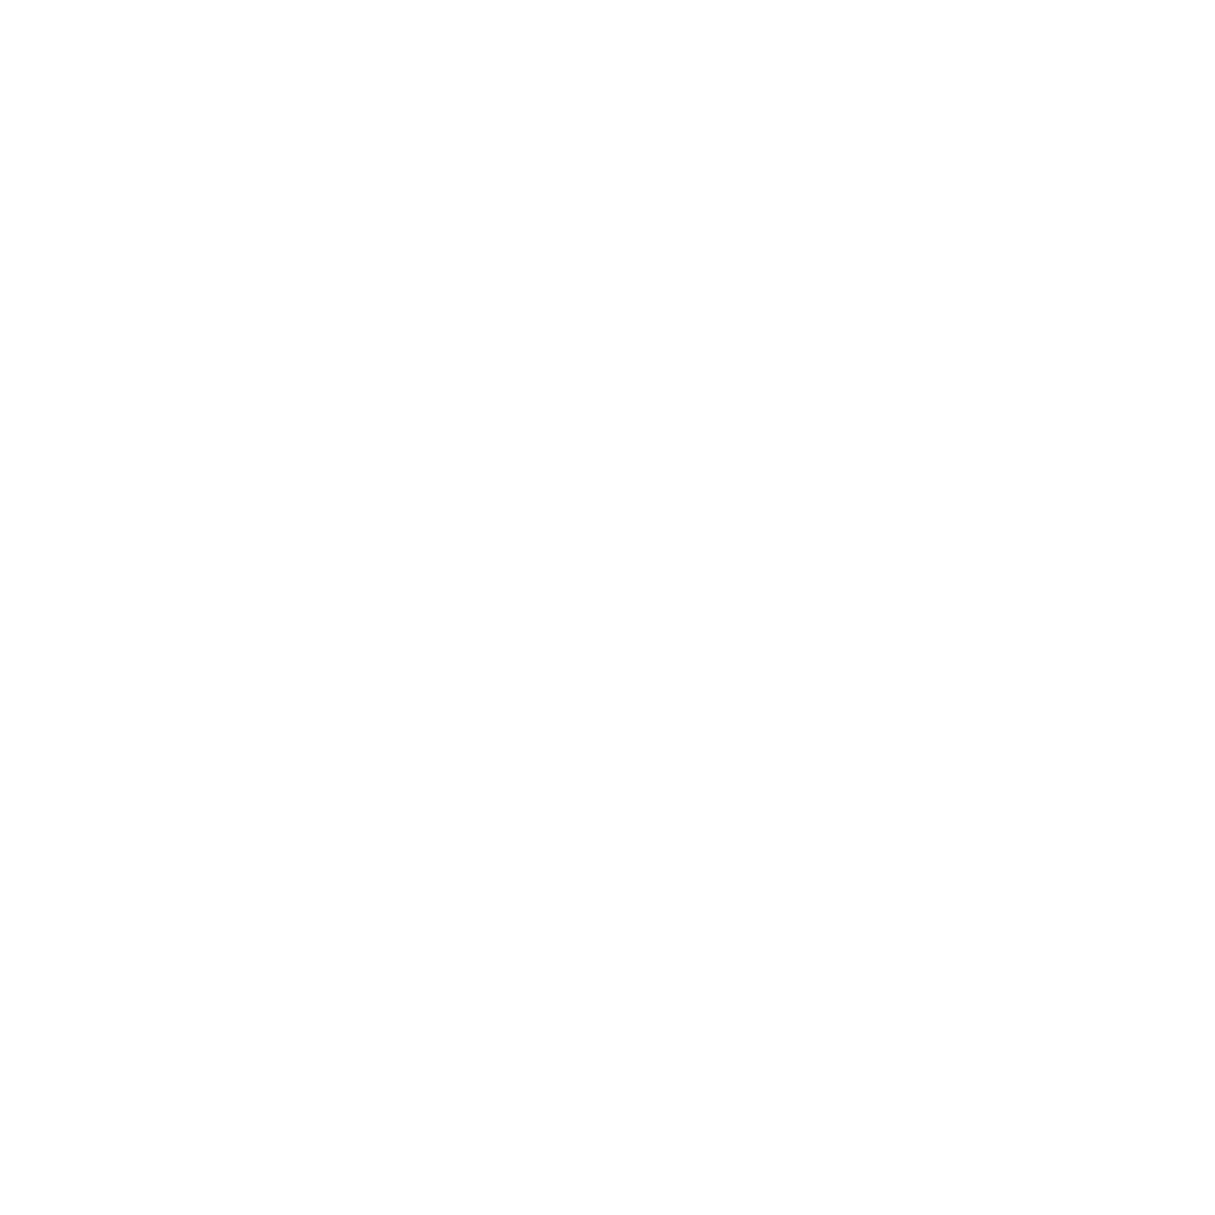 Bradford Magic Circle